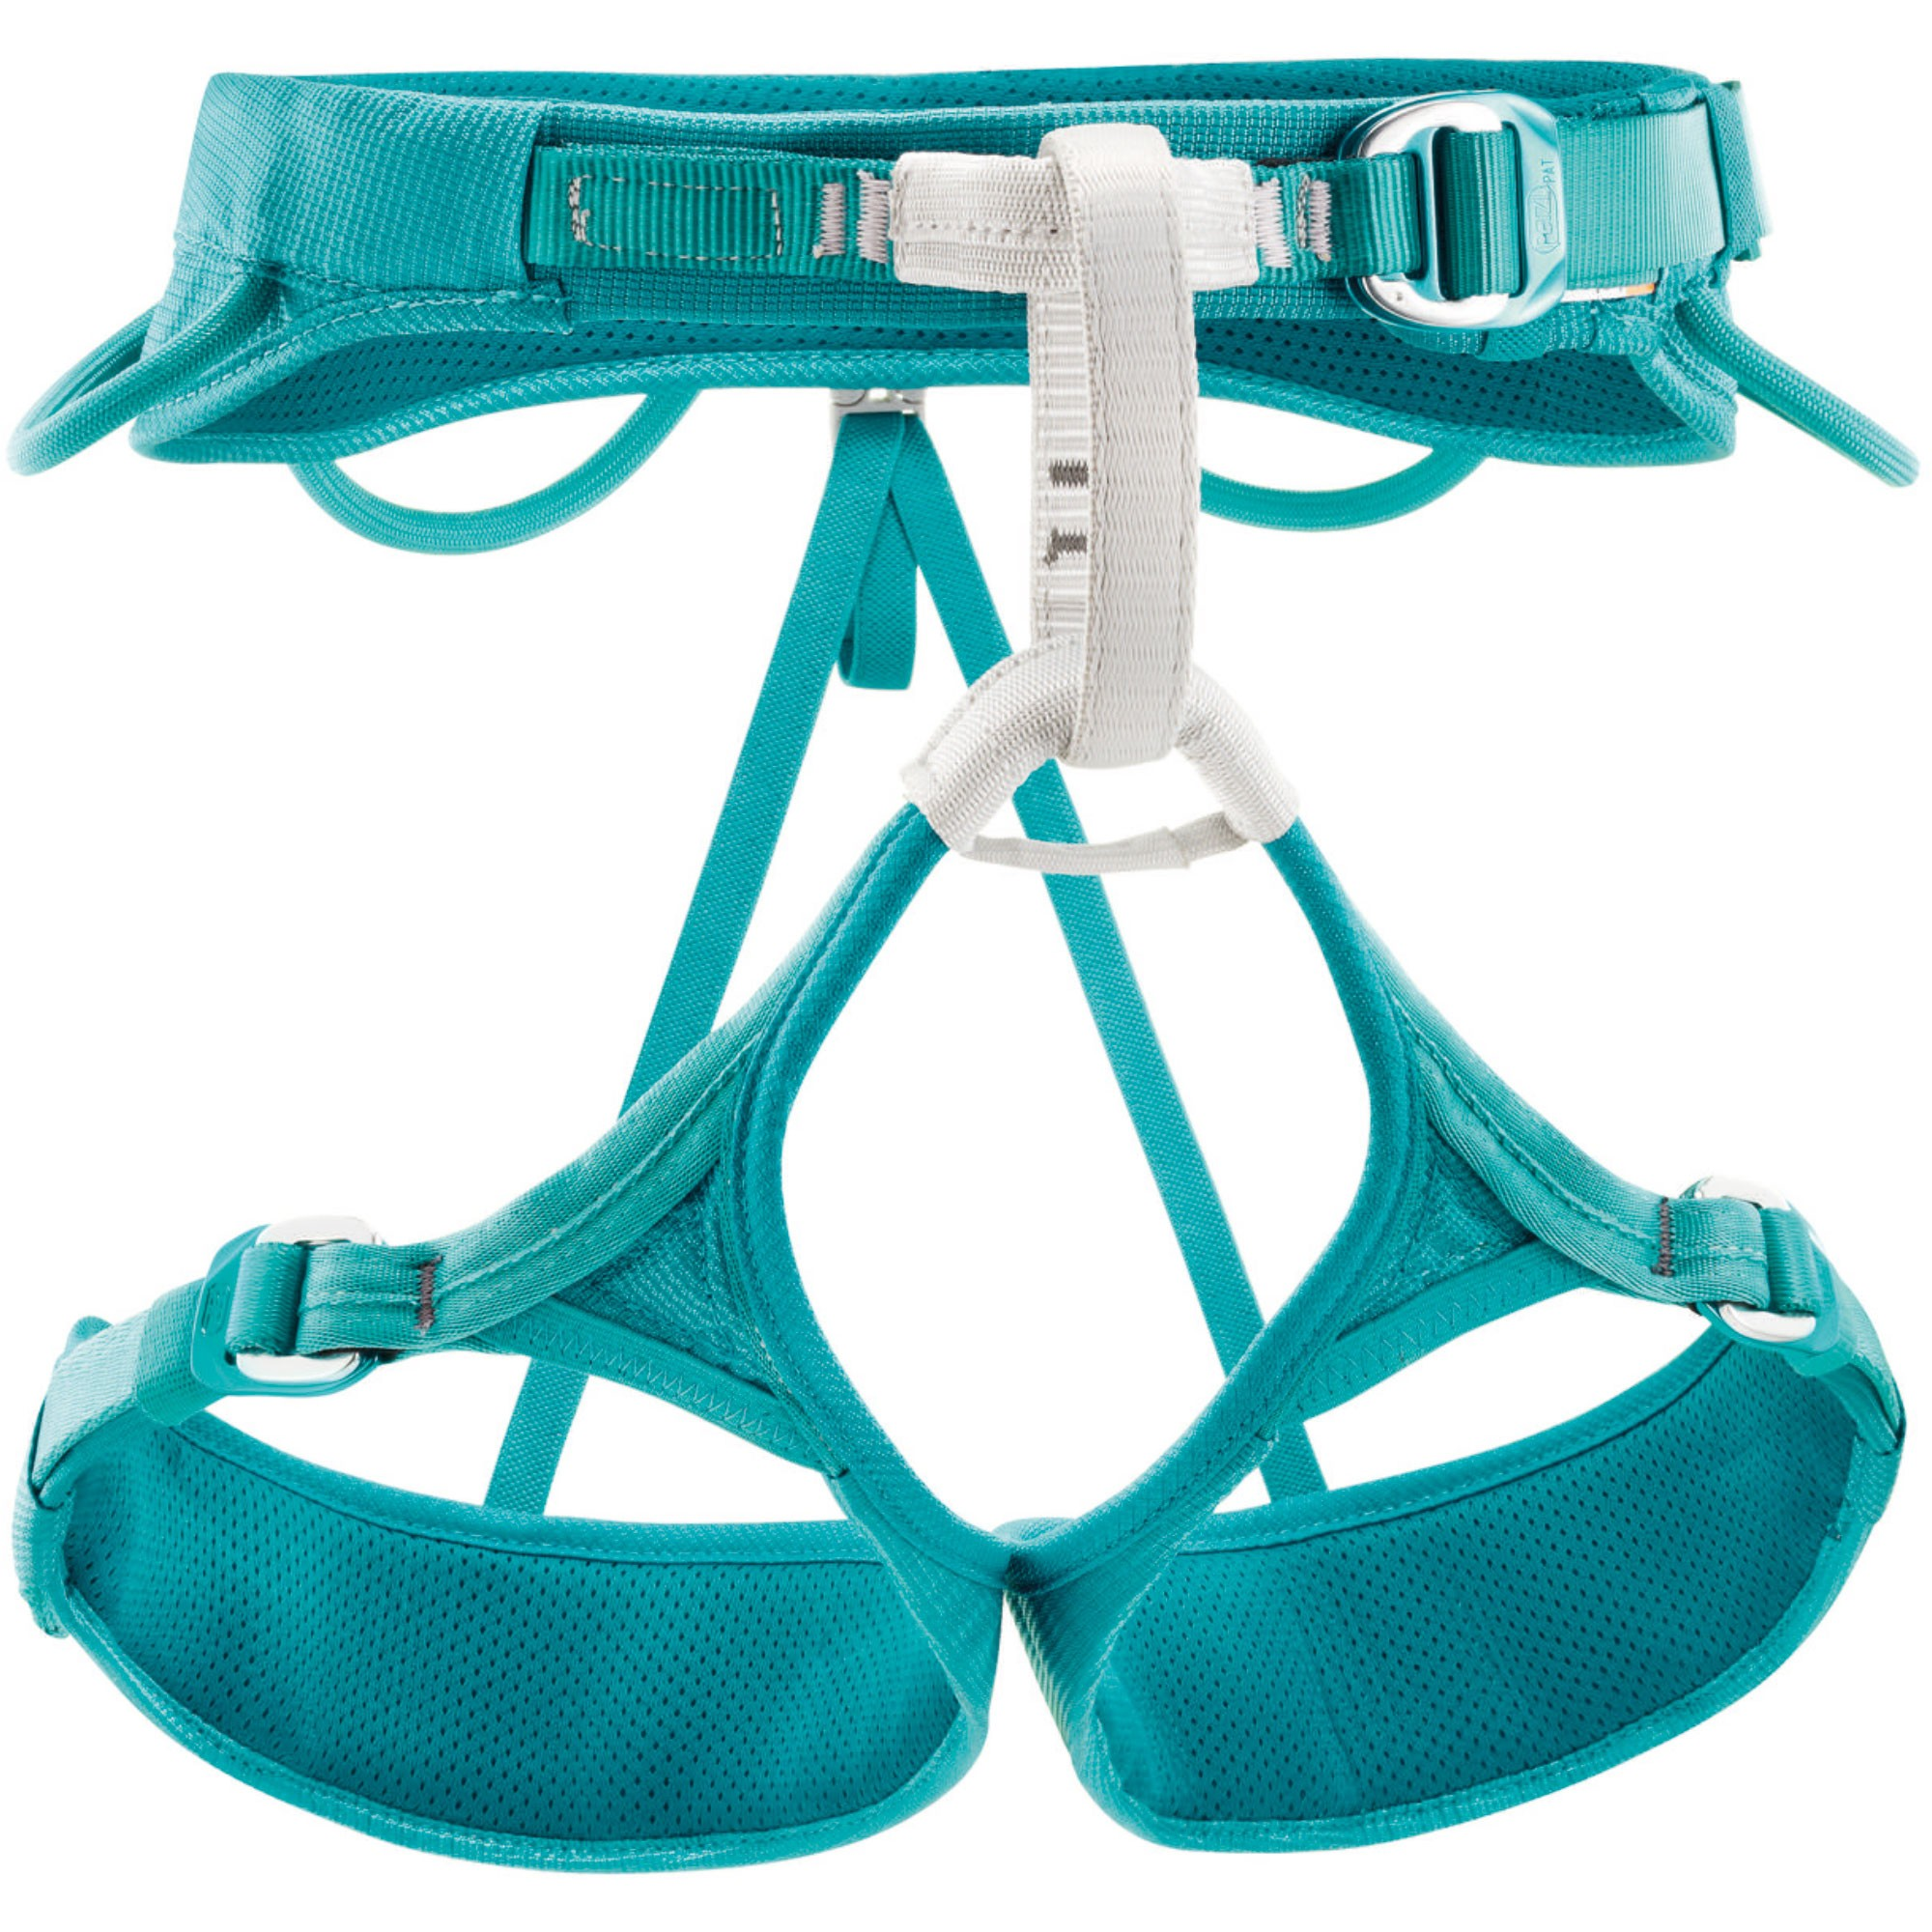 PETZL - Women's Luna Climbing Harness - Turquoise